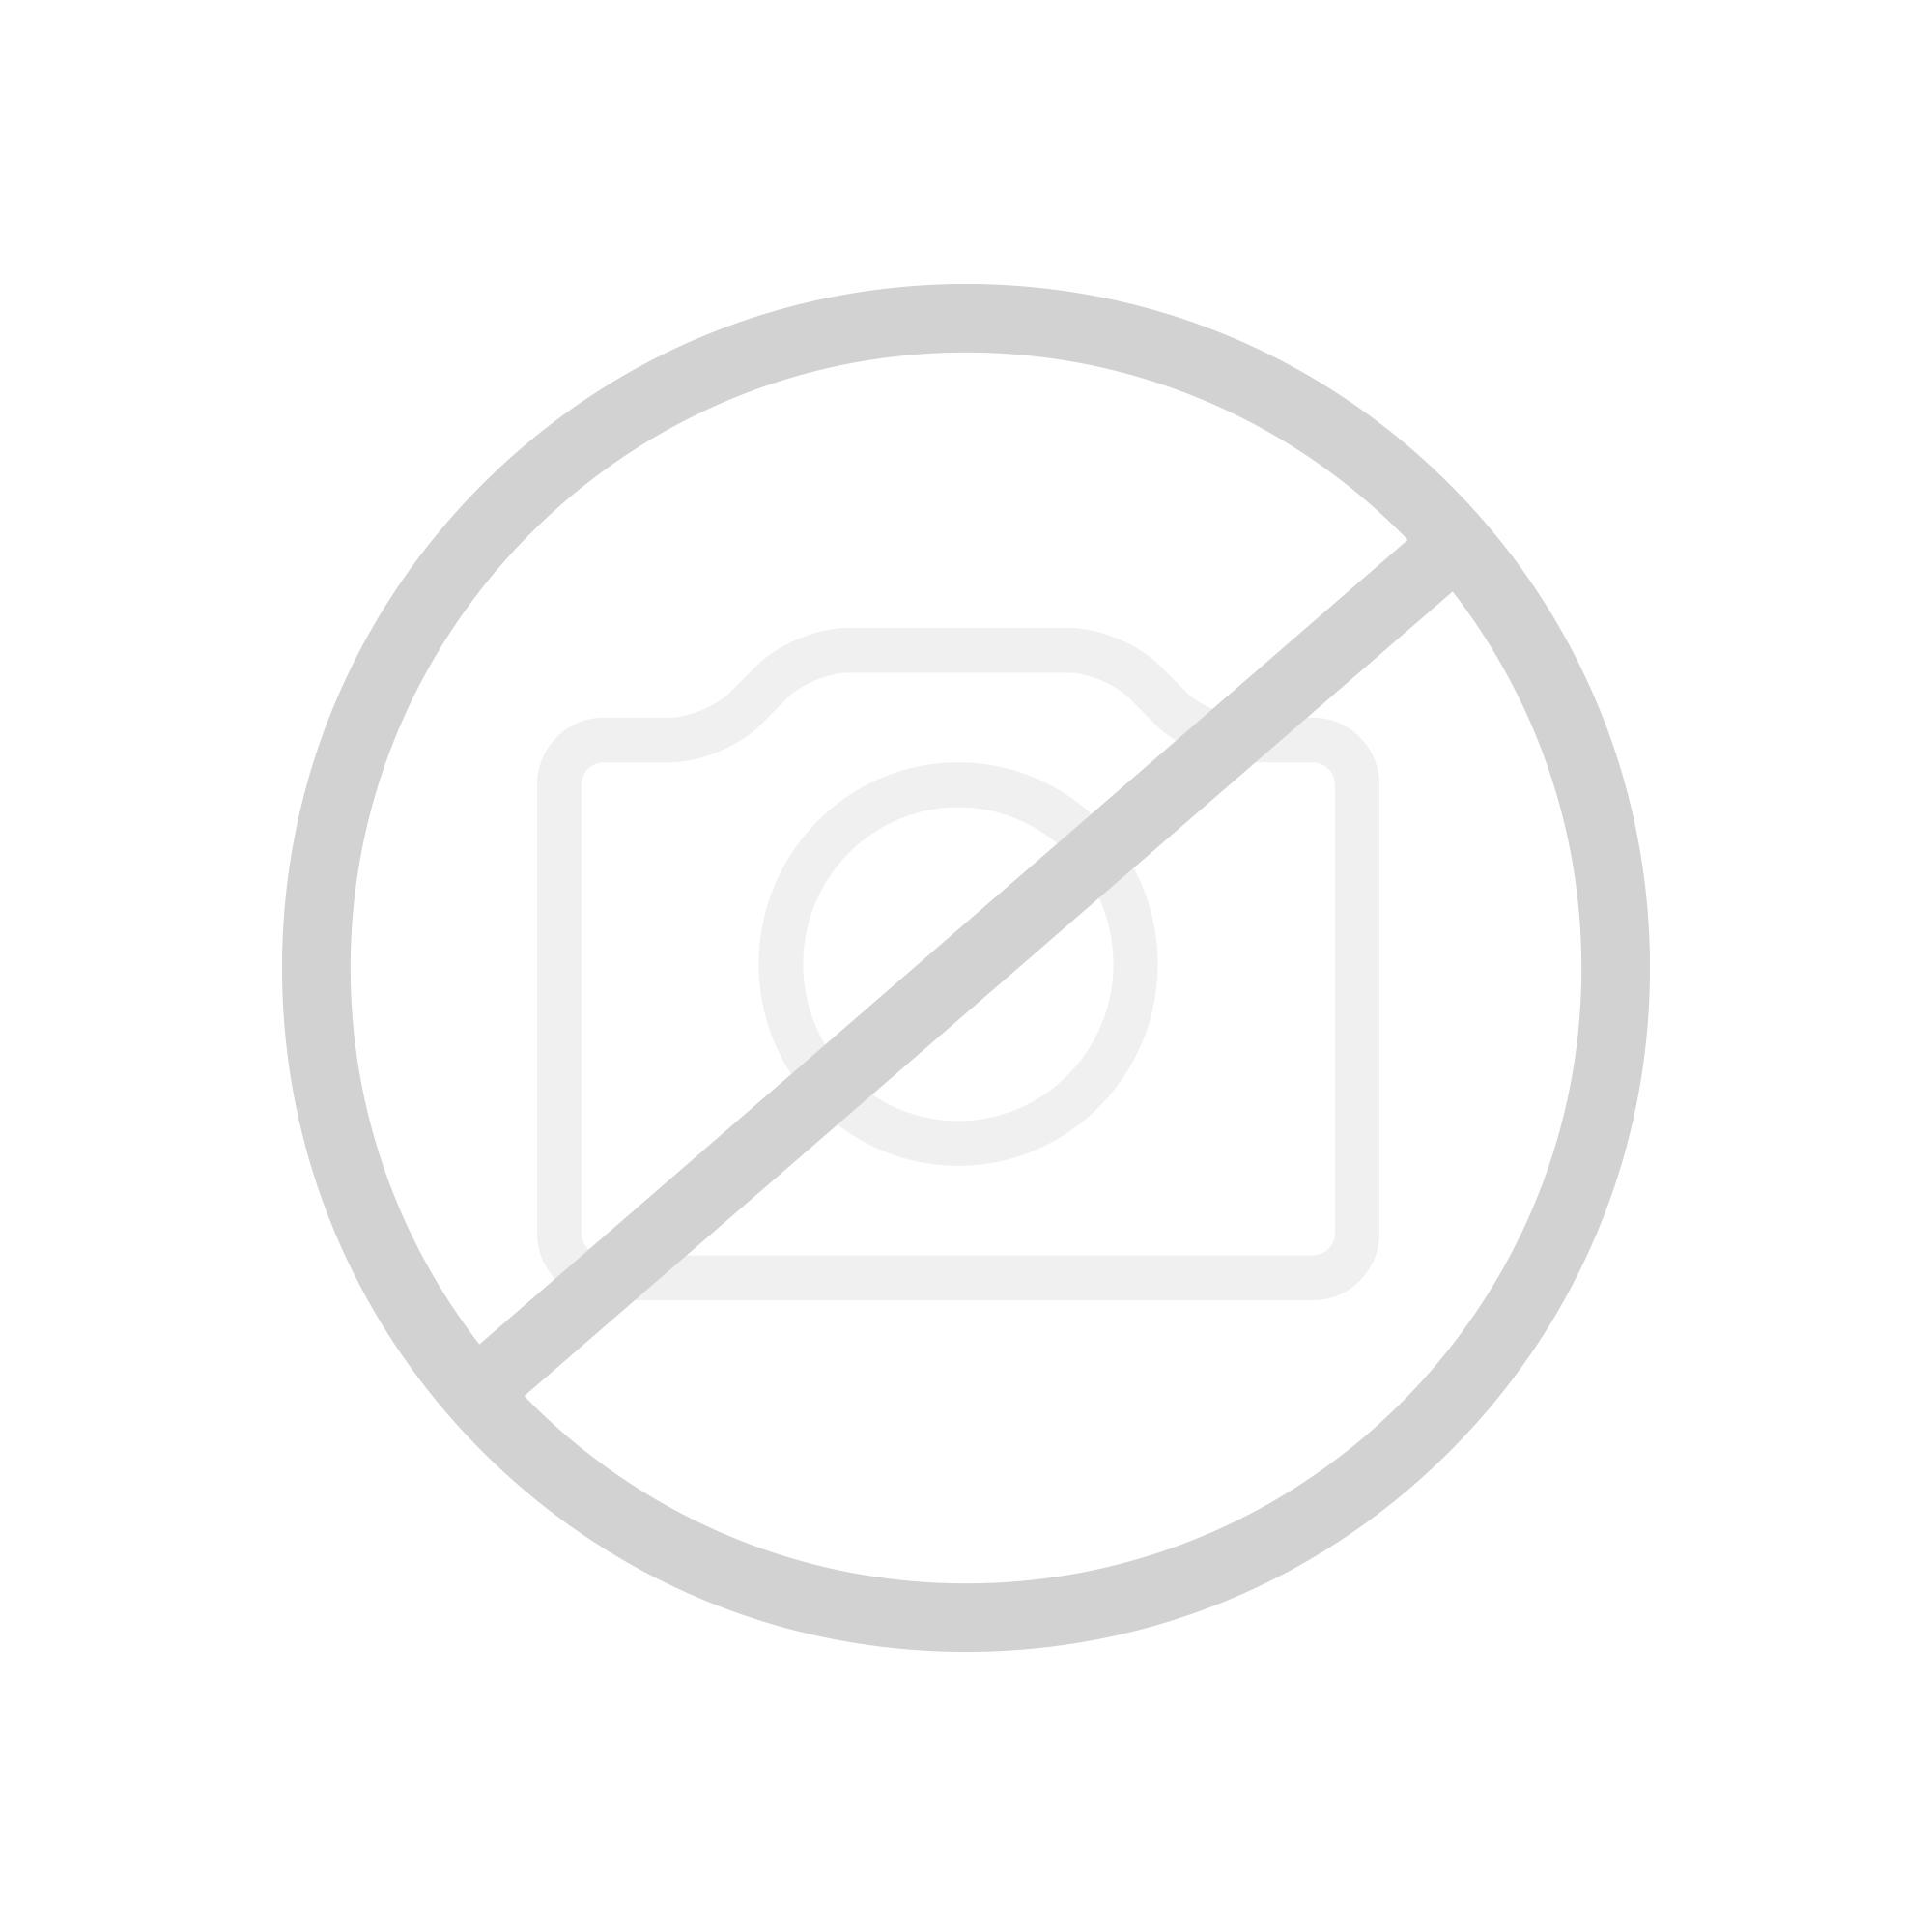 duravit happy d 2 wand tiefsp l wc b 36 5 l 62 cm rimless wei mit wondergliss 25500900001. Black Bedroom Furniture Sets. Home Design Ideas